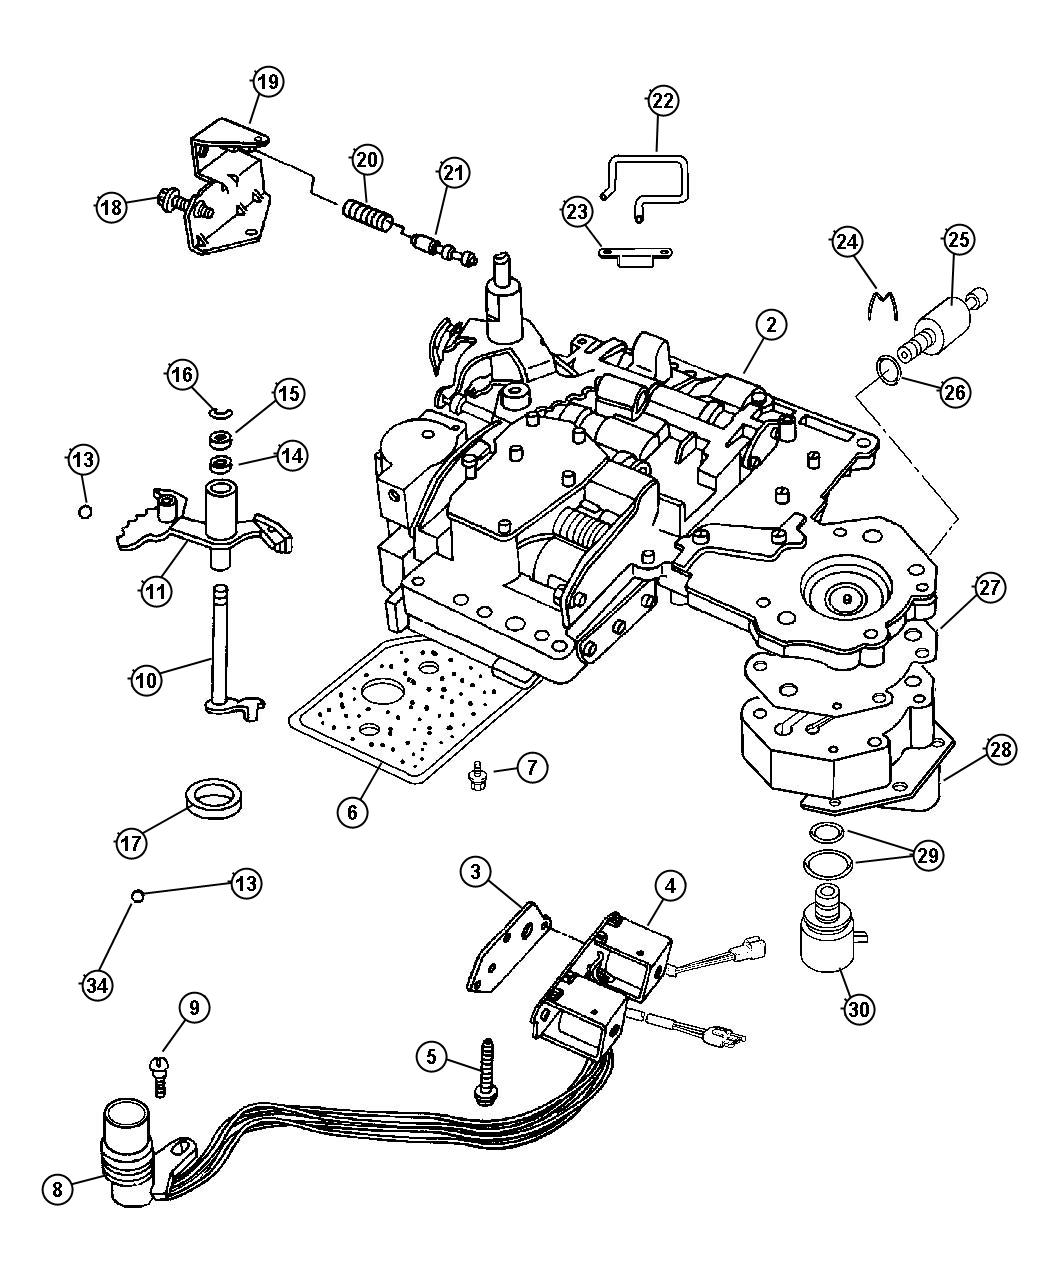 48re transmission valve body diagram